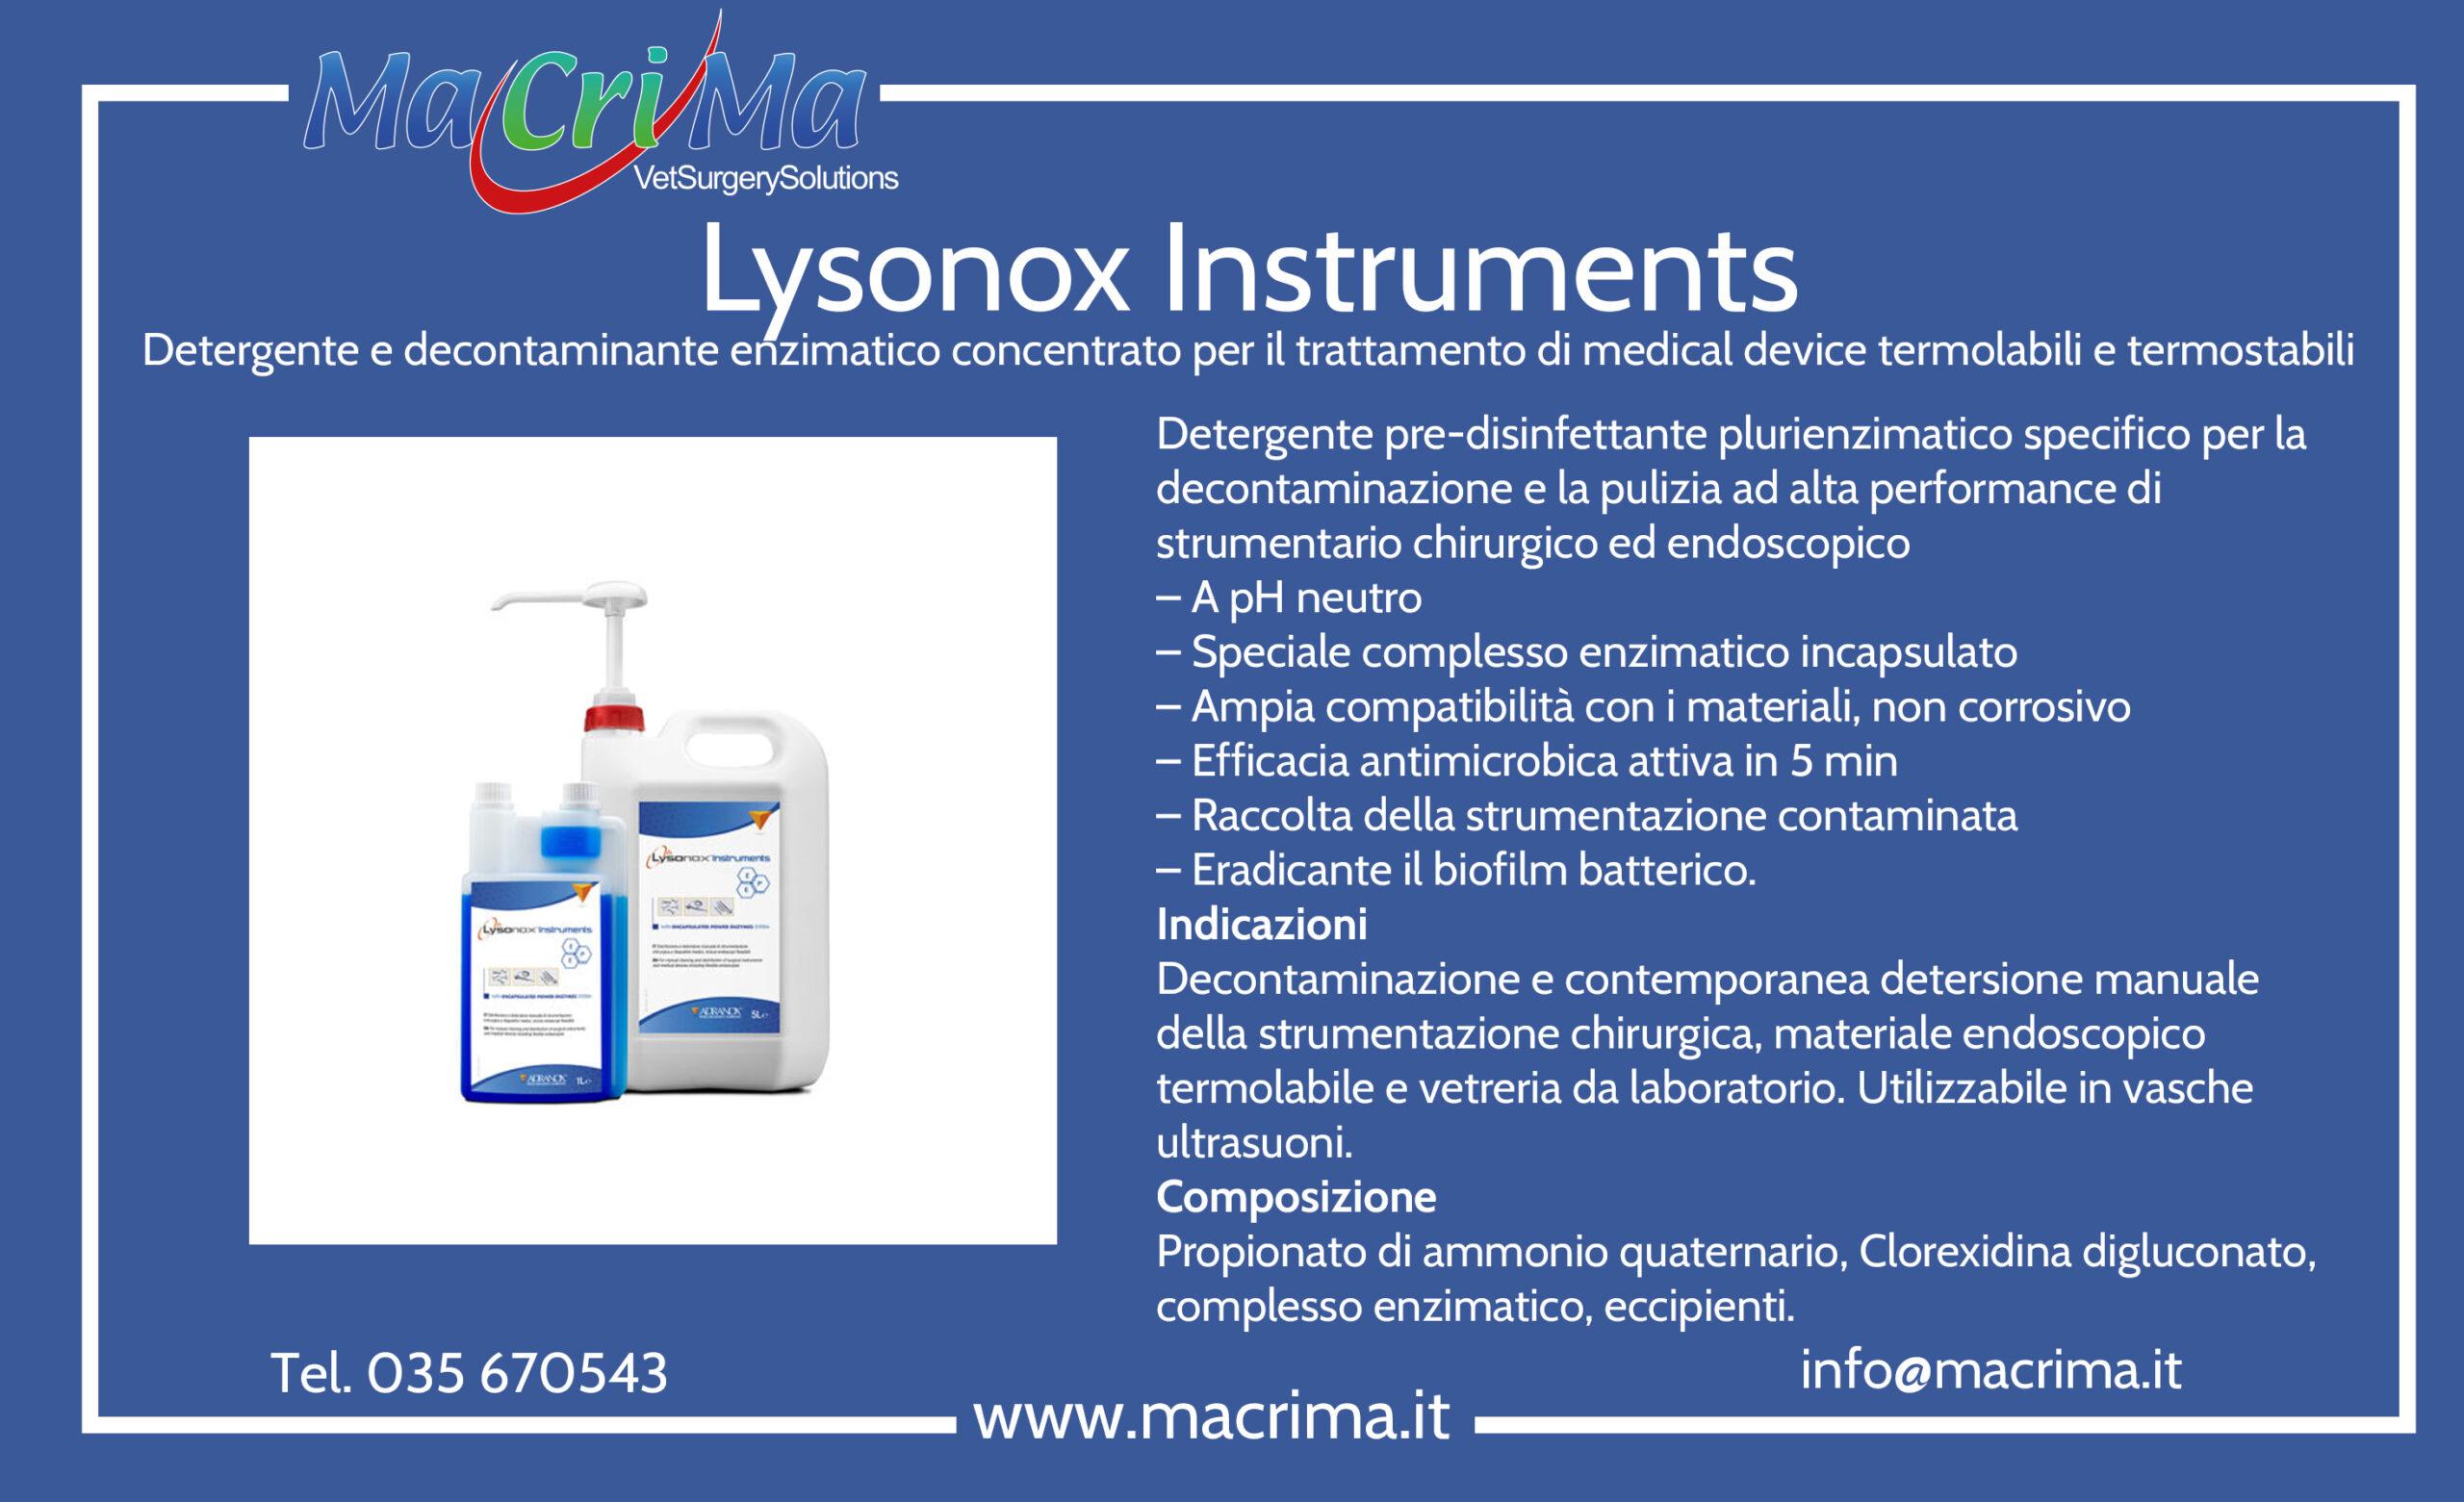 Lysonox Instruments